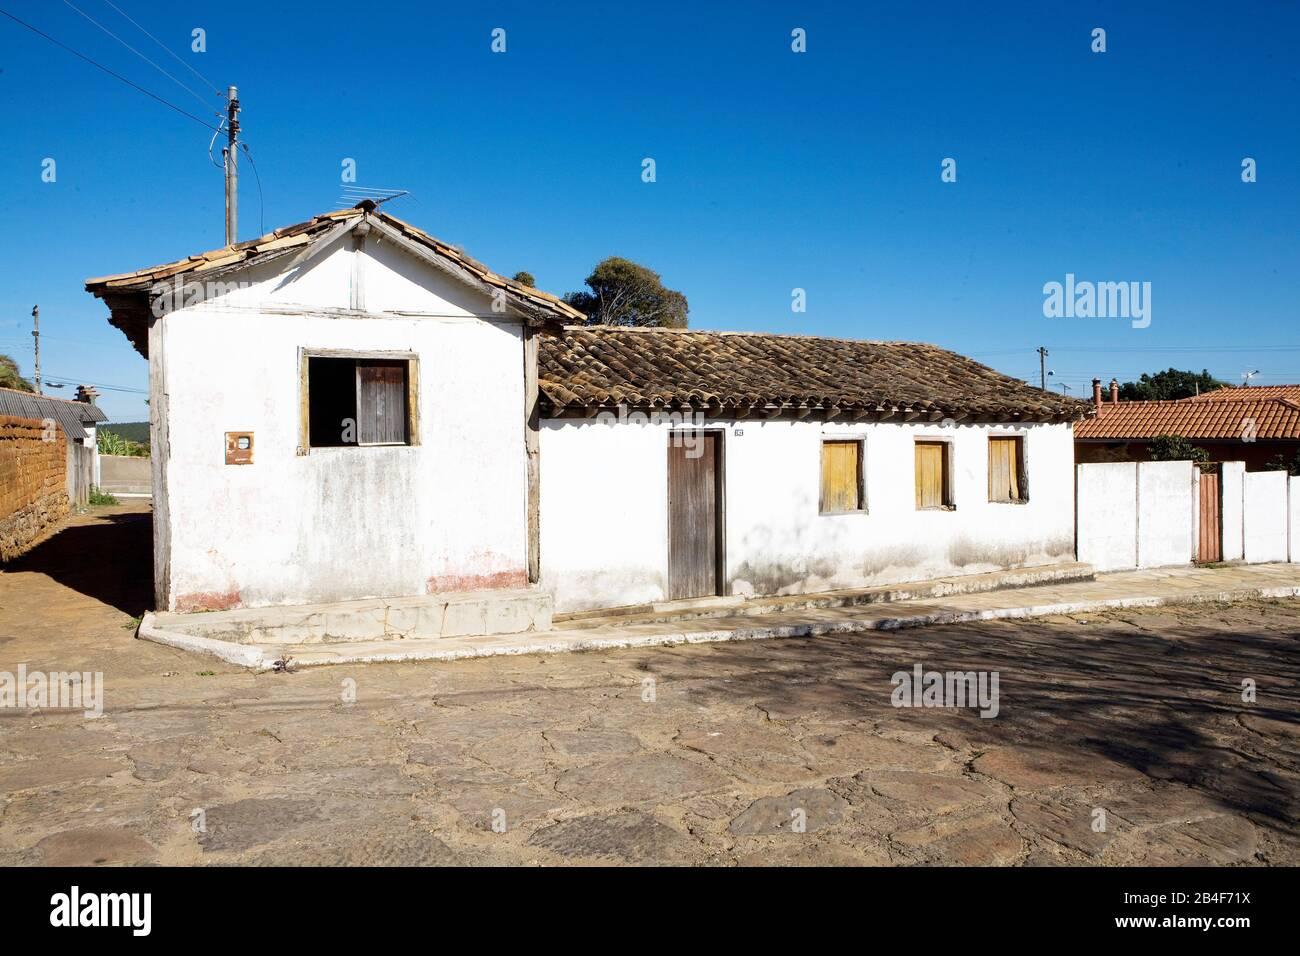 Casario e pavimento original de rua na cidade de Datas, colonial, barroco, Casario, Pavement, Original, Dates, Minas Gerais, Brazil Stock Photo